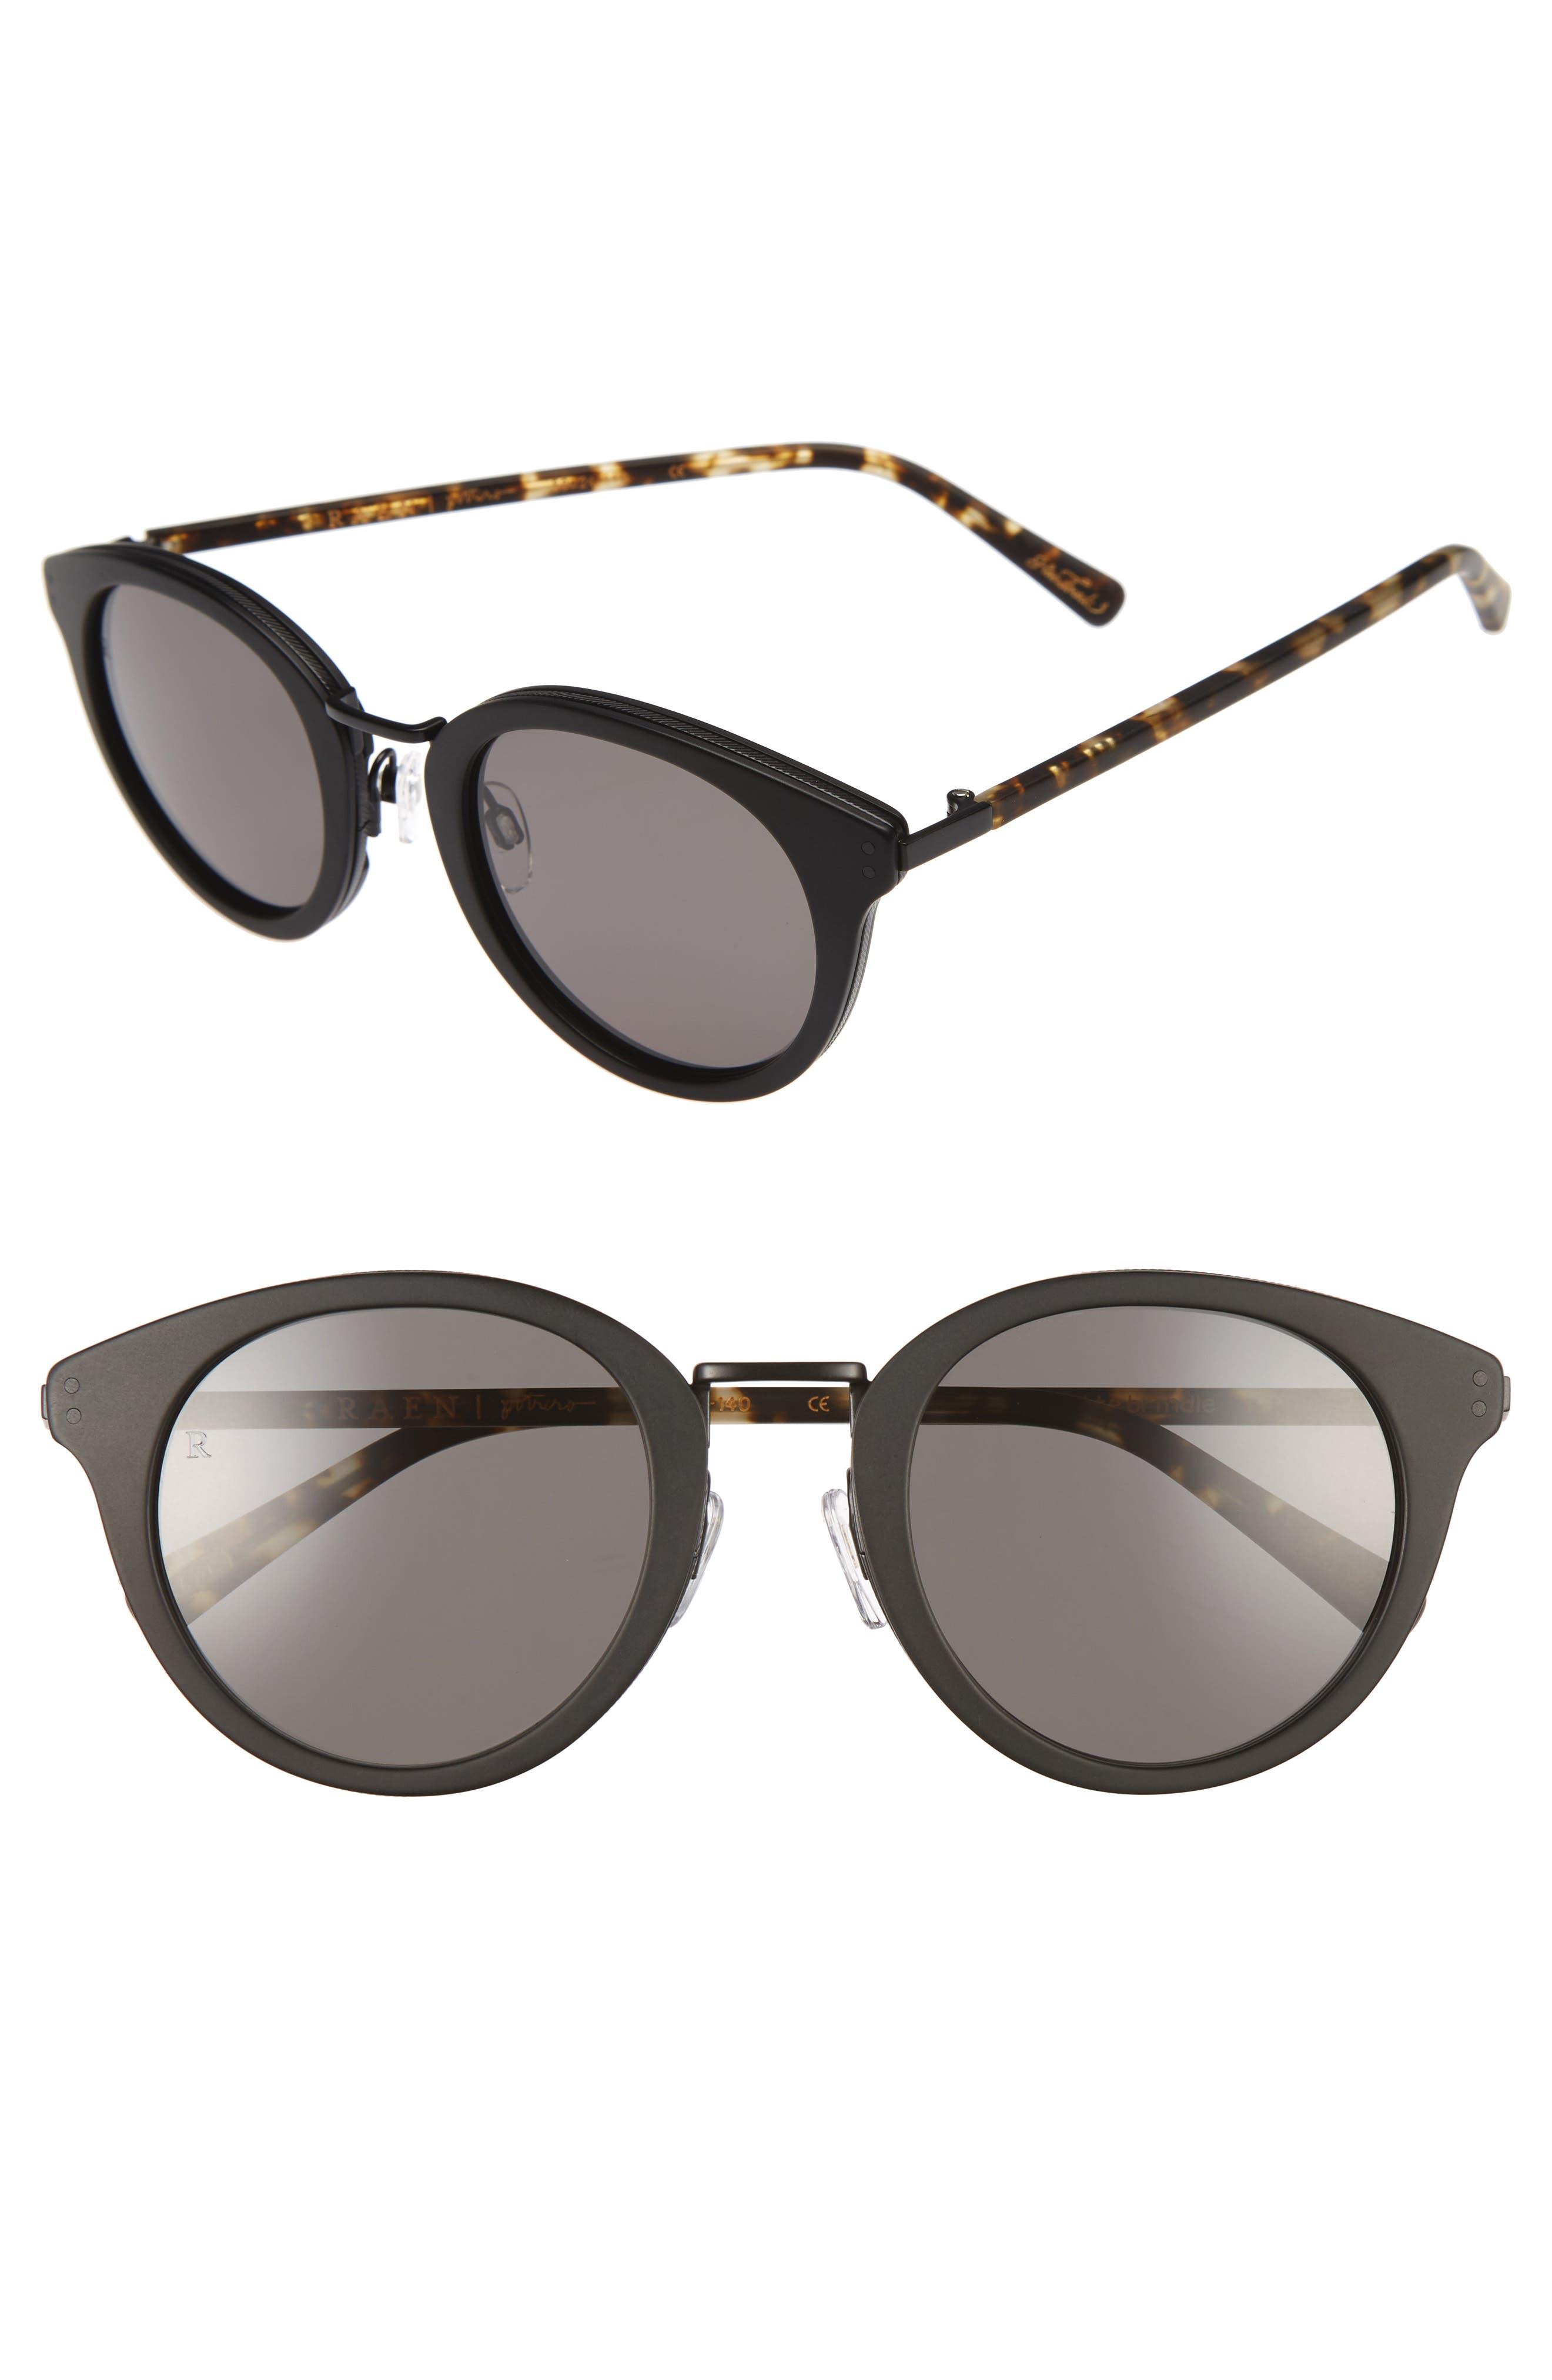 Potrero 50mm Sunglasses,                             Alternate thumbnail 2, color,                             001